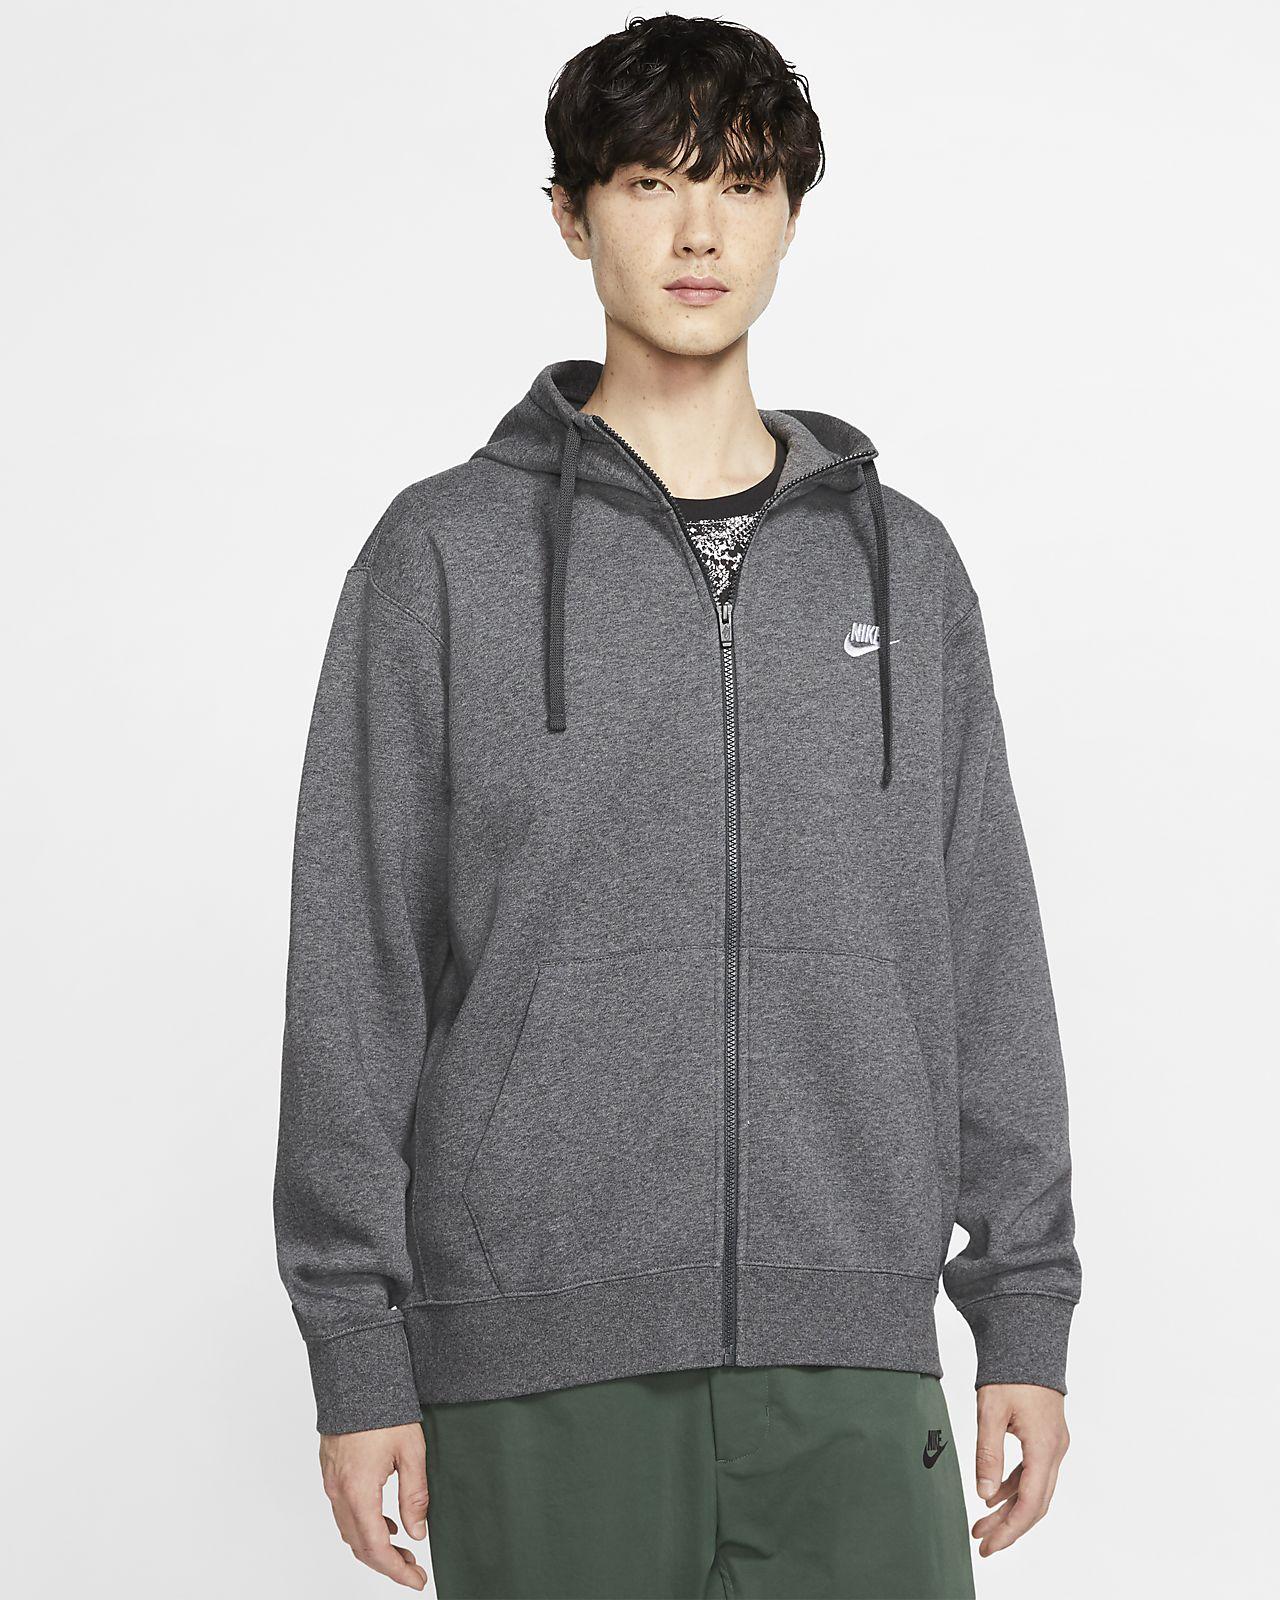 Sportswear Club Fleece Nike Felpa Uomo